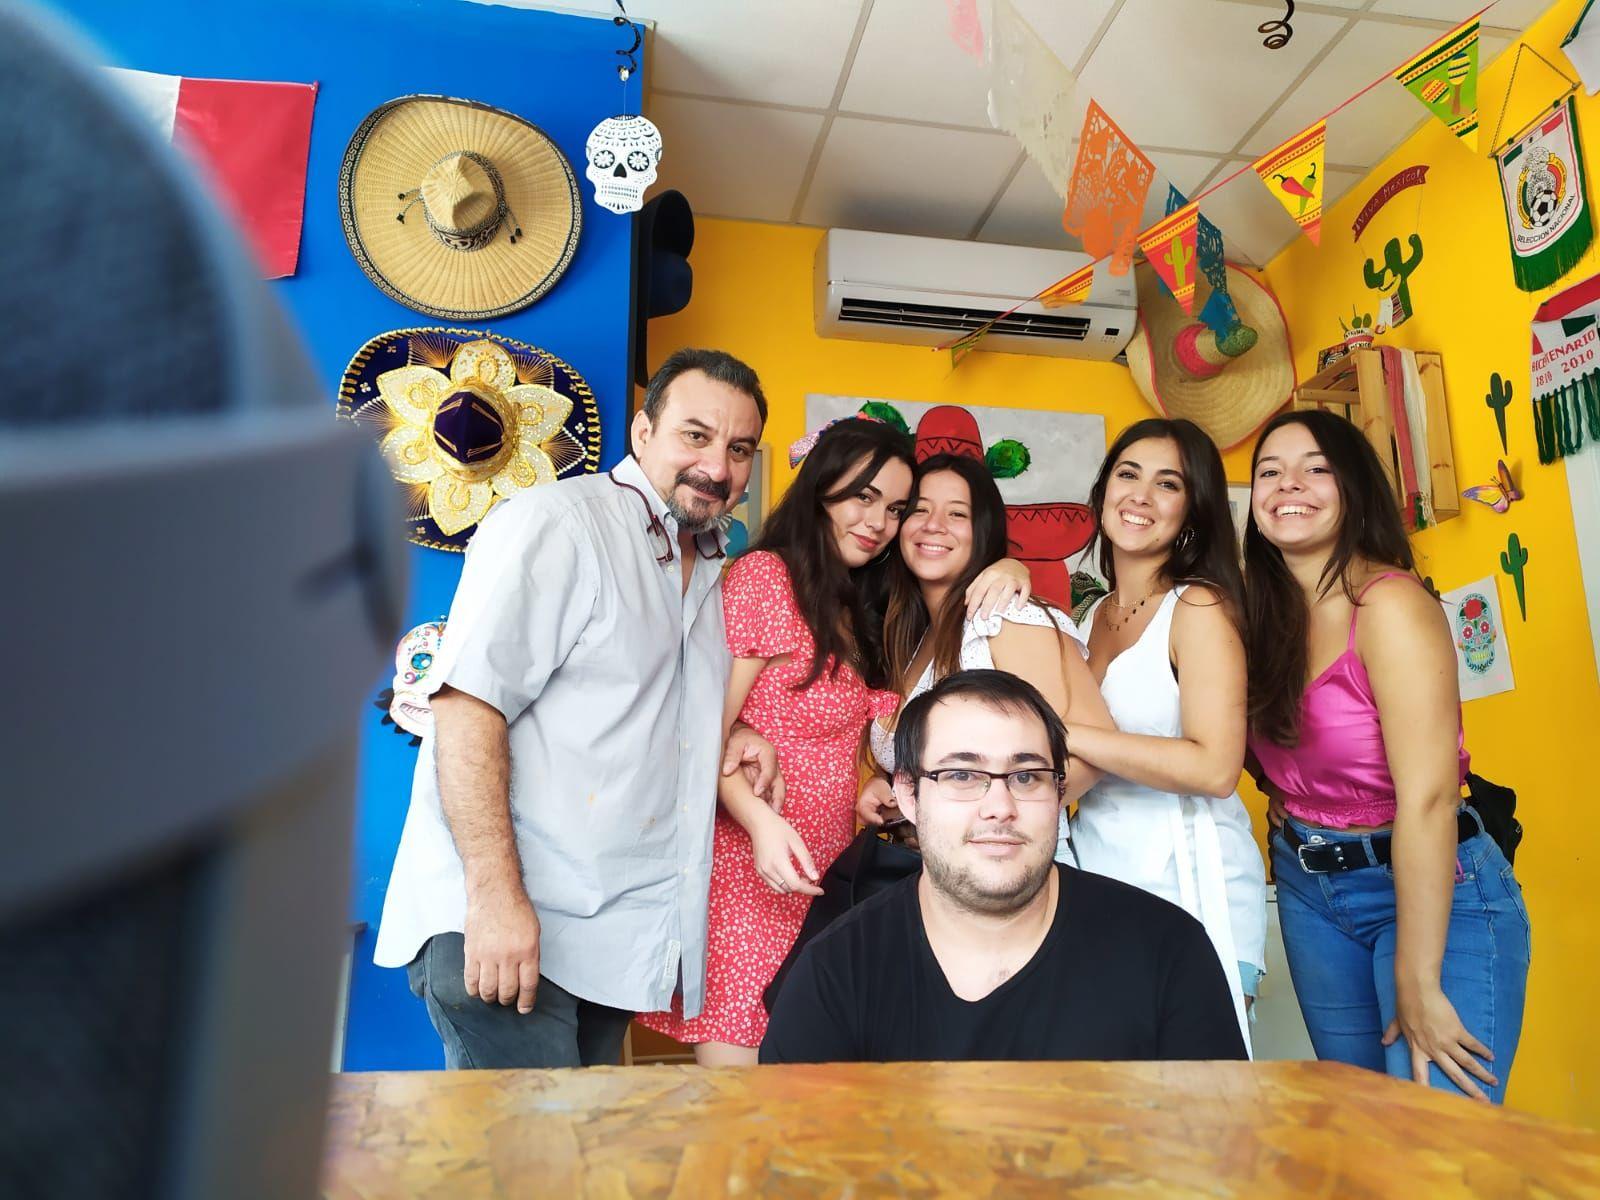 Foto 5 de Restaurante mexicano en  | Cantina La Catrina